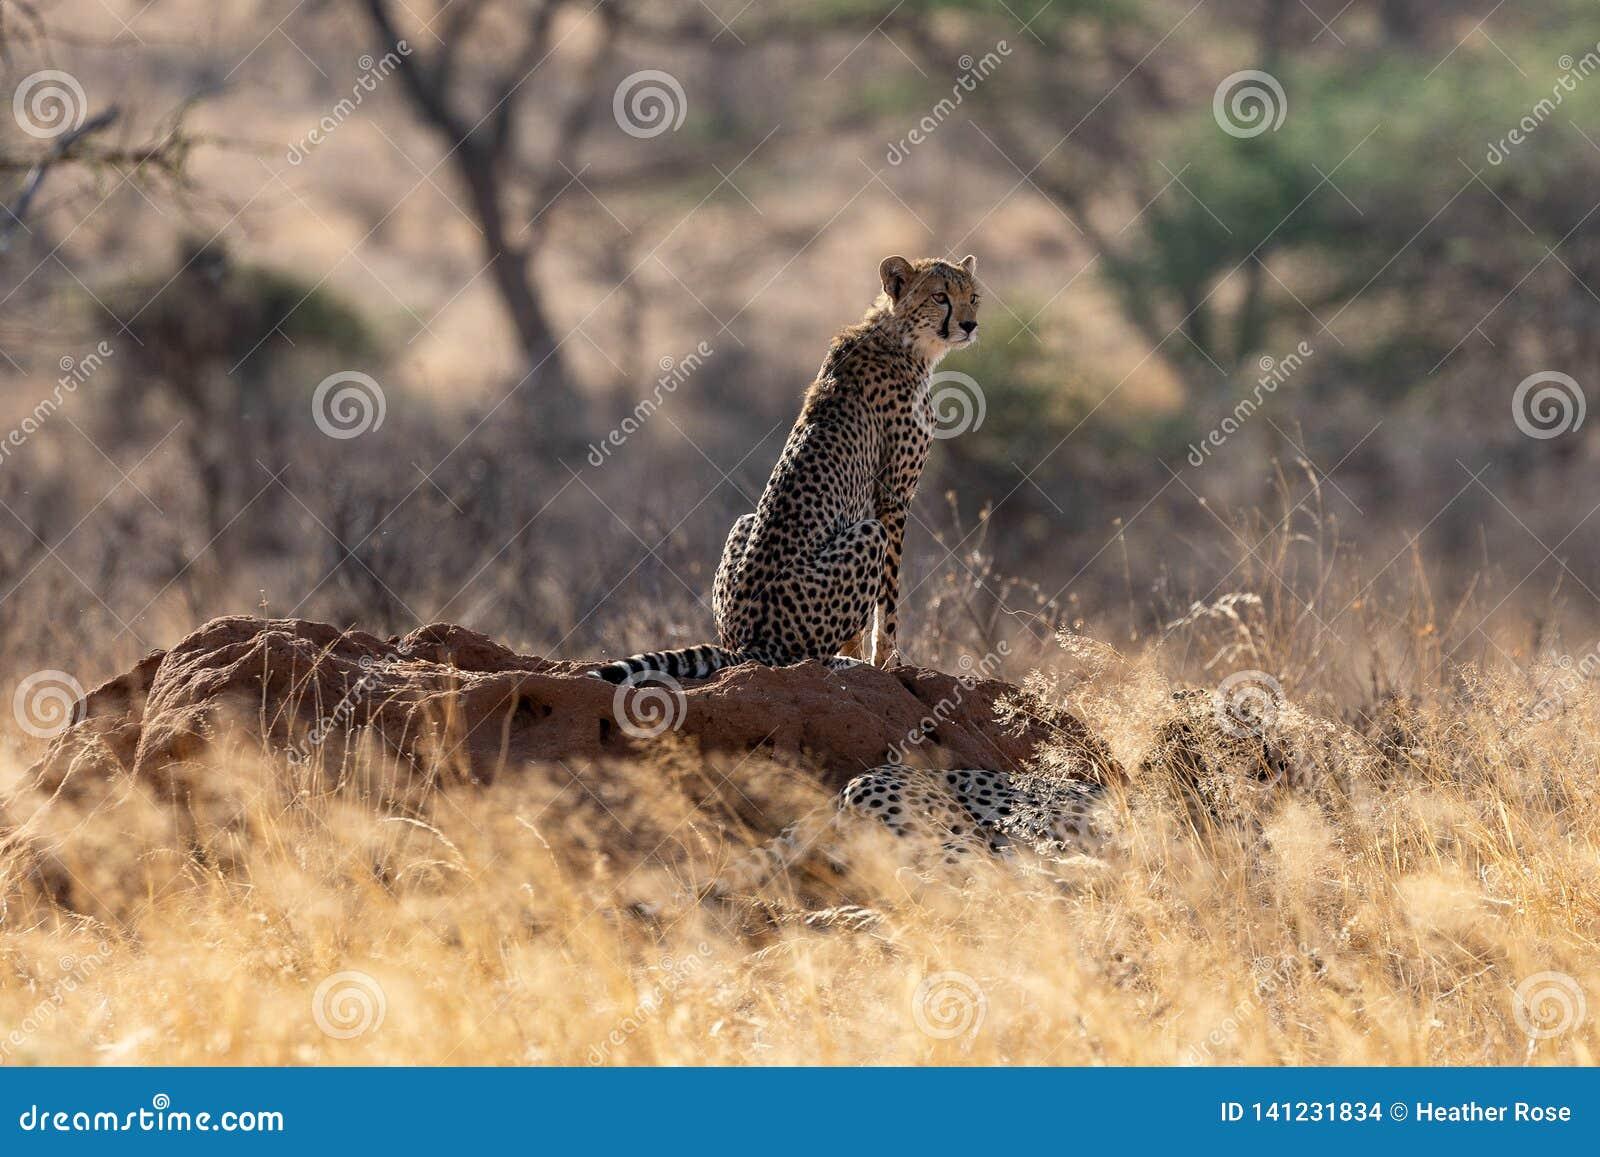 Jachtluipaard in het ochtendlicht op de vlaktes in Masai Mara, Kenia, Afrika